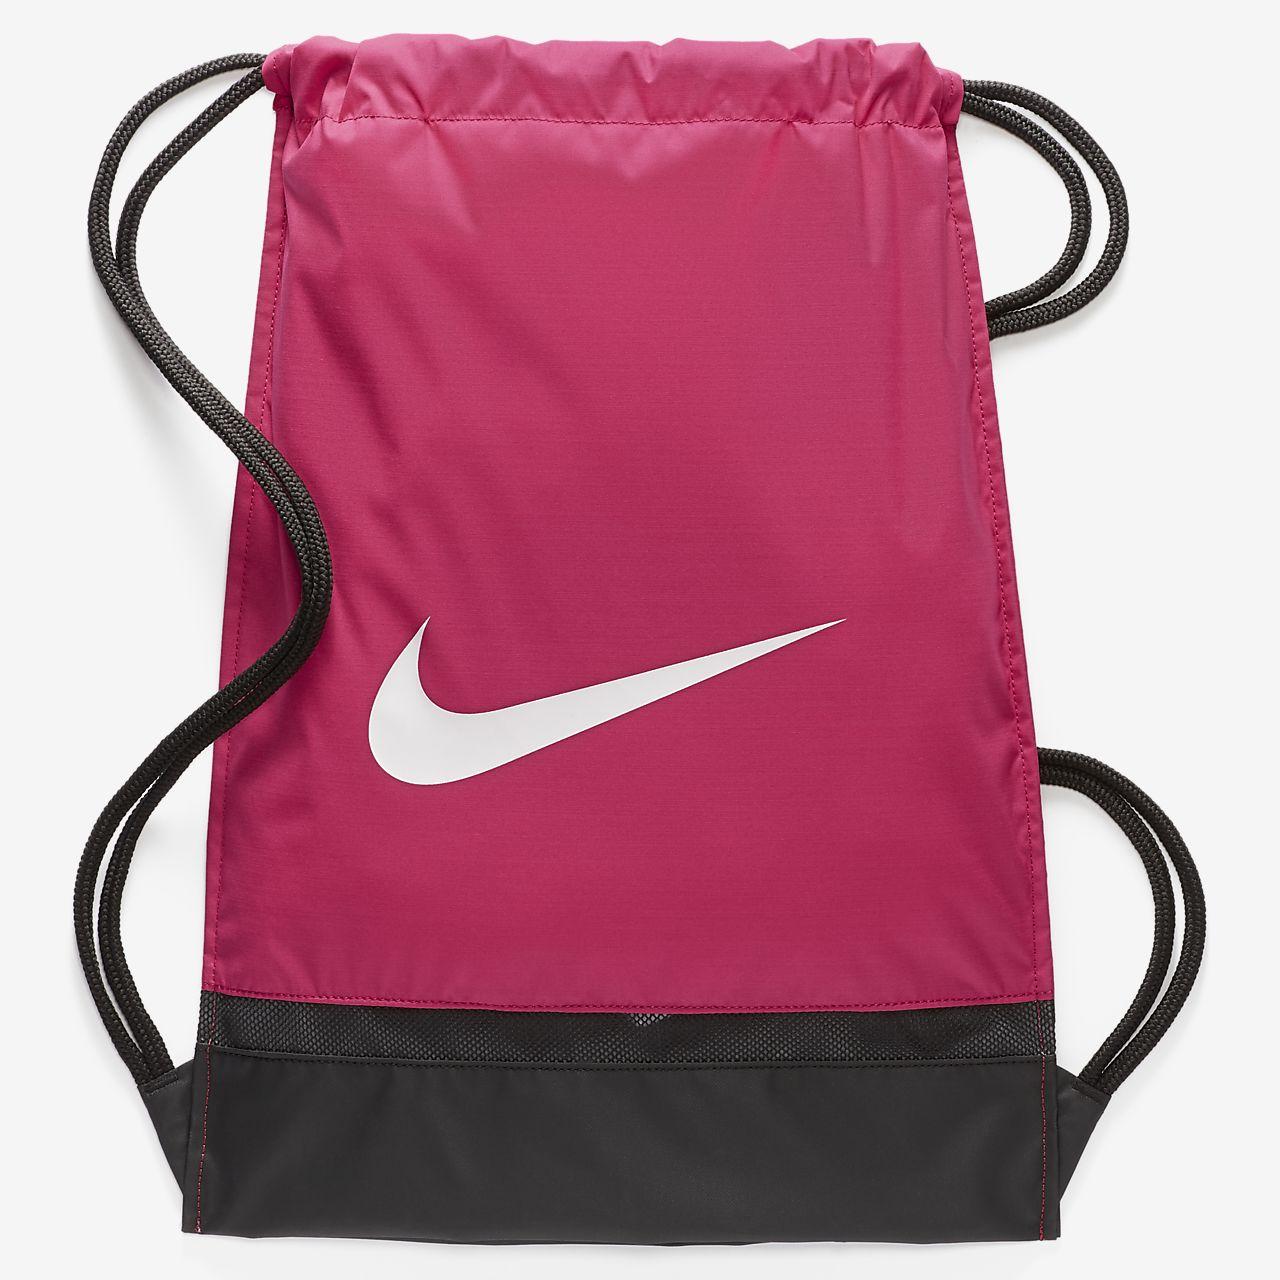 Sac de gym pour l'entraînement Nike Brasilia